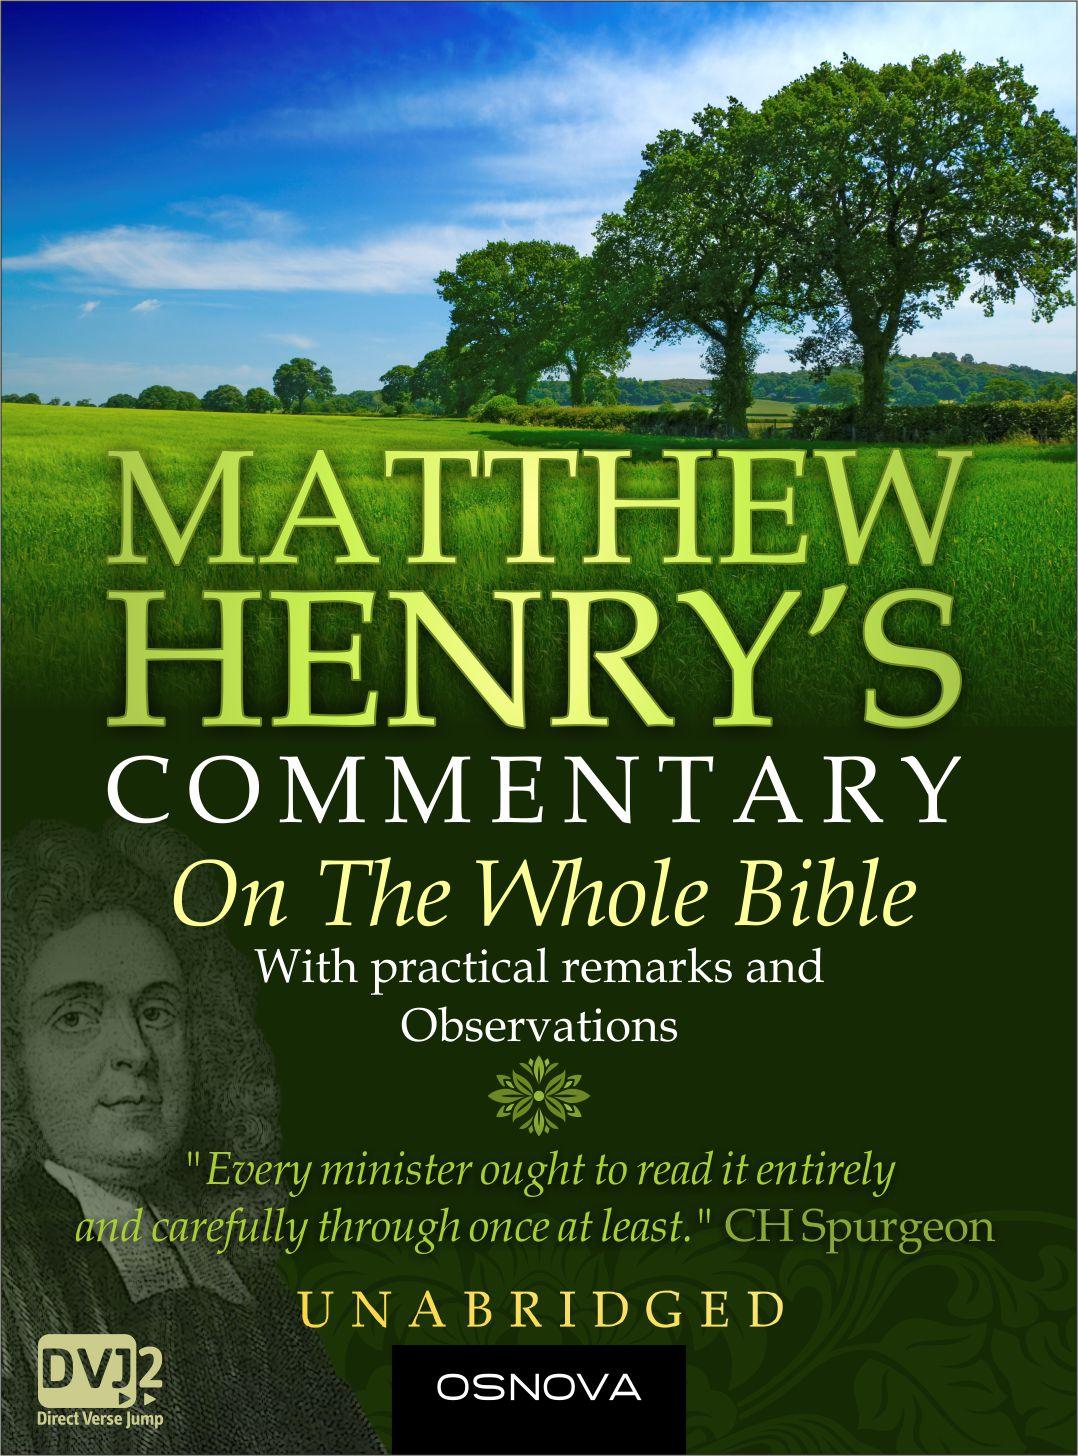 Matthew 2 - ESV - Christianity.com